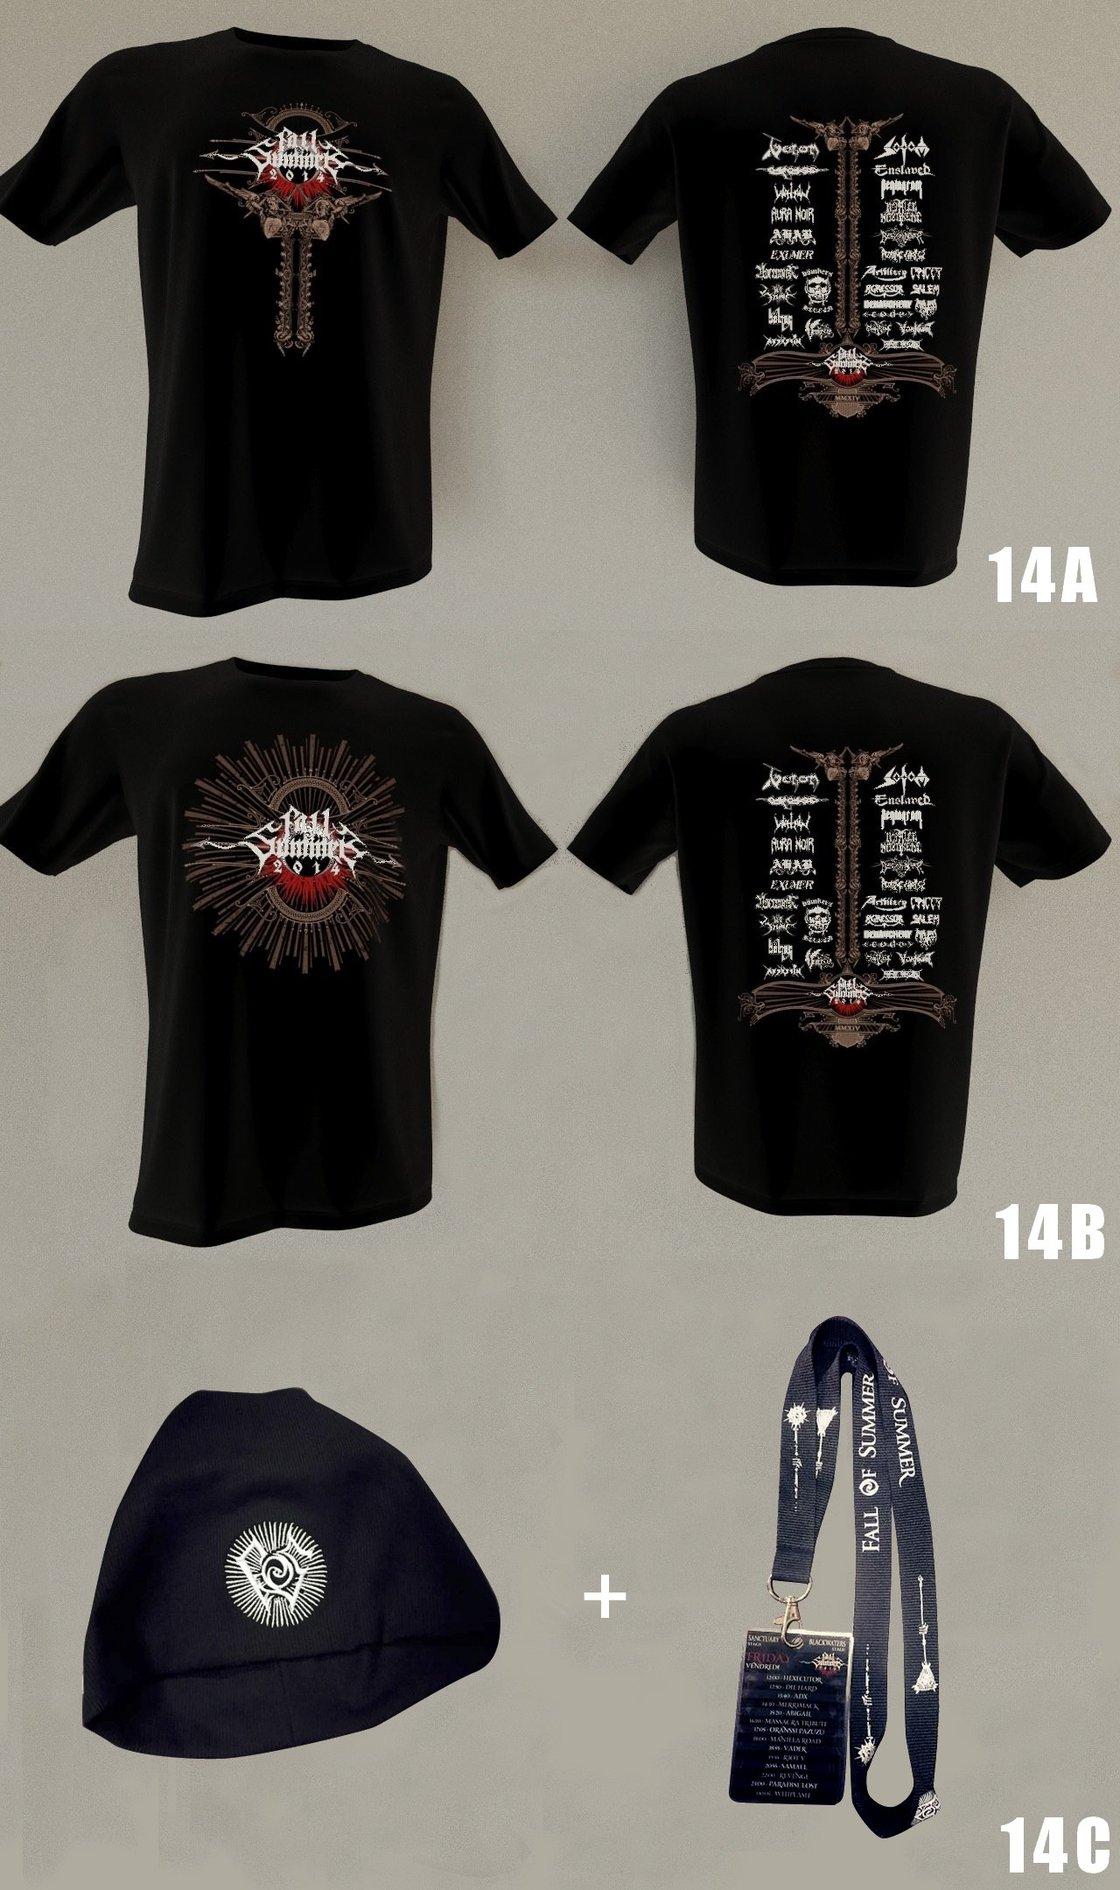 Image of Tee-shirts FoS 2014, Beanie & Lanyard